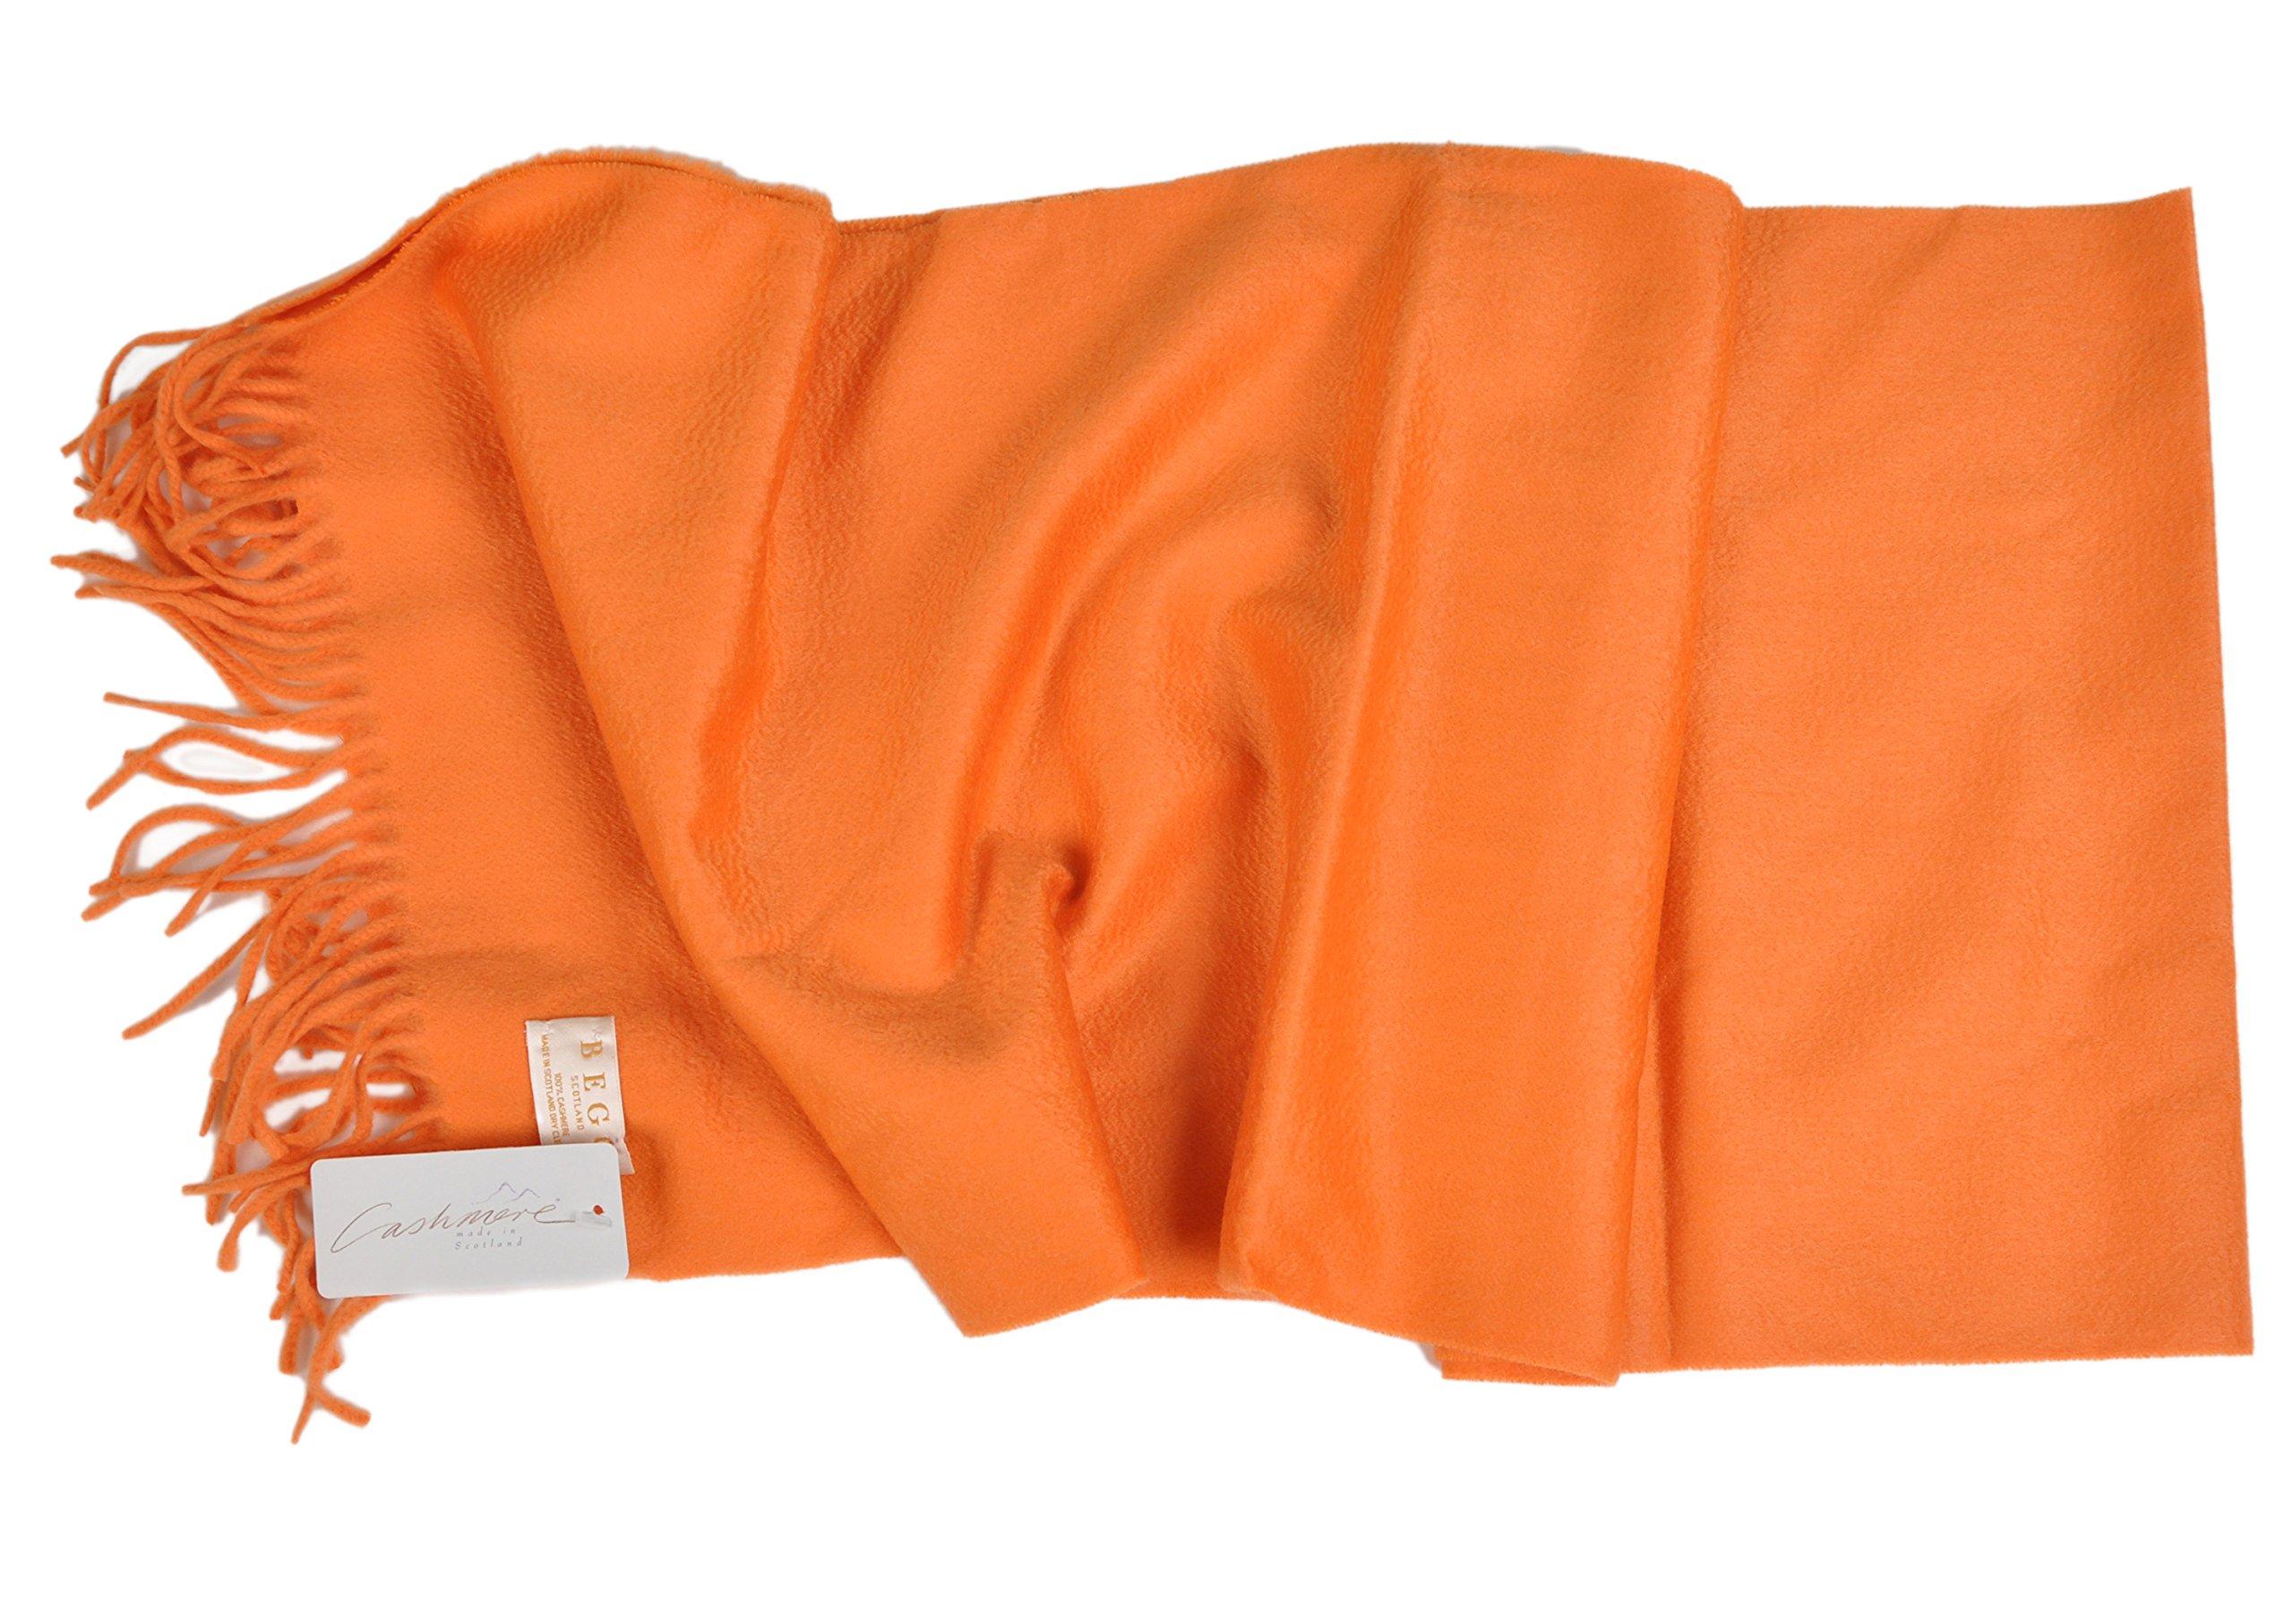 Begg-Scotland 14''x72'' Pure Luxury Cashmere Large Scarf - Mandarin